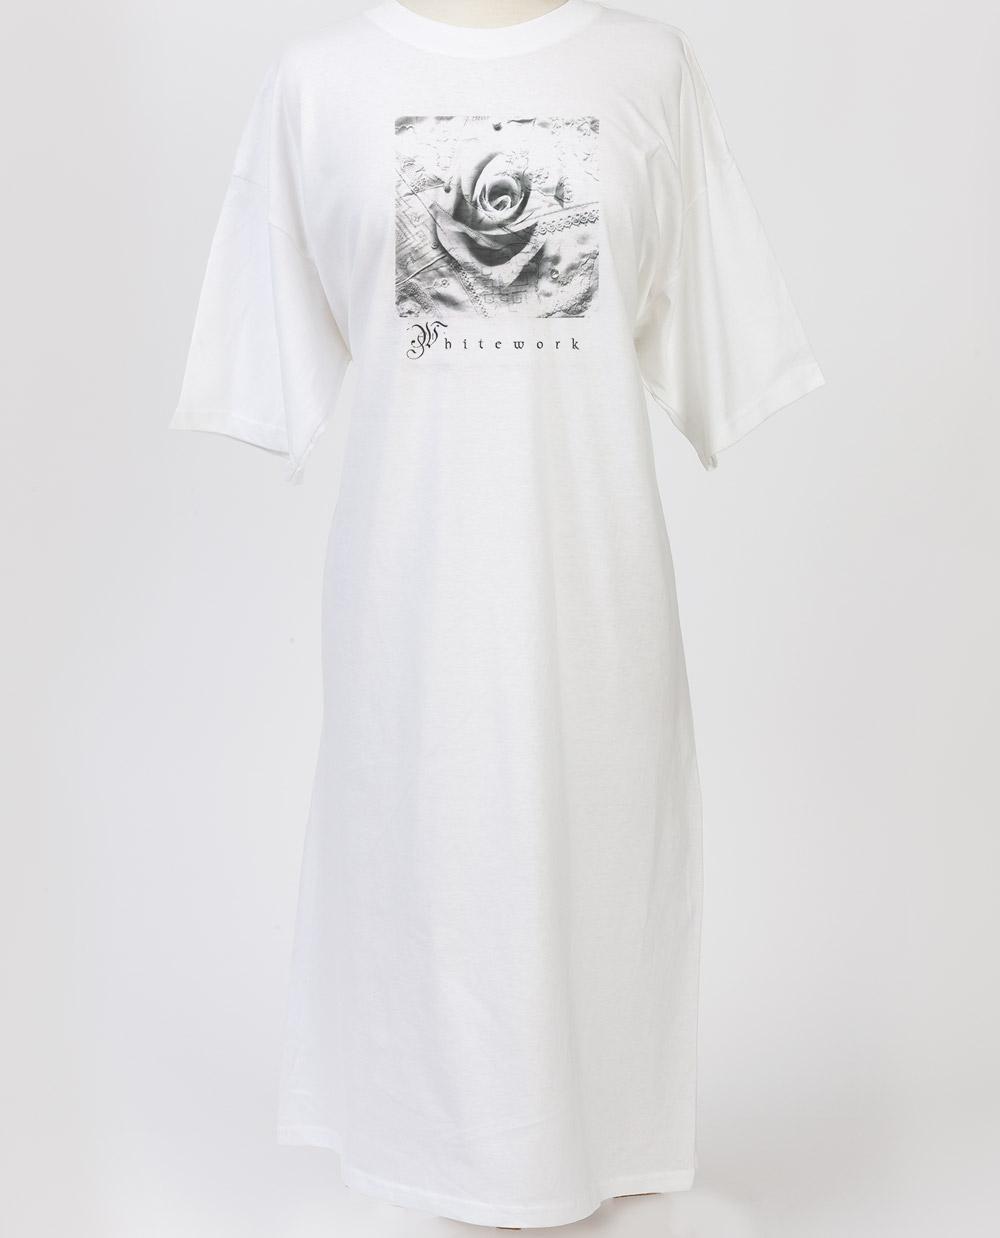 Night shirt - White works Collage Design